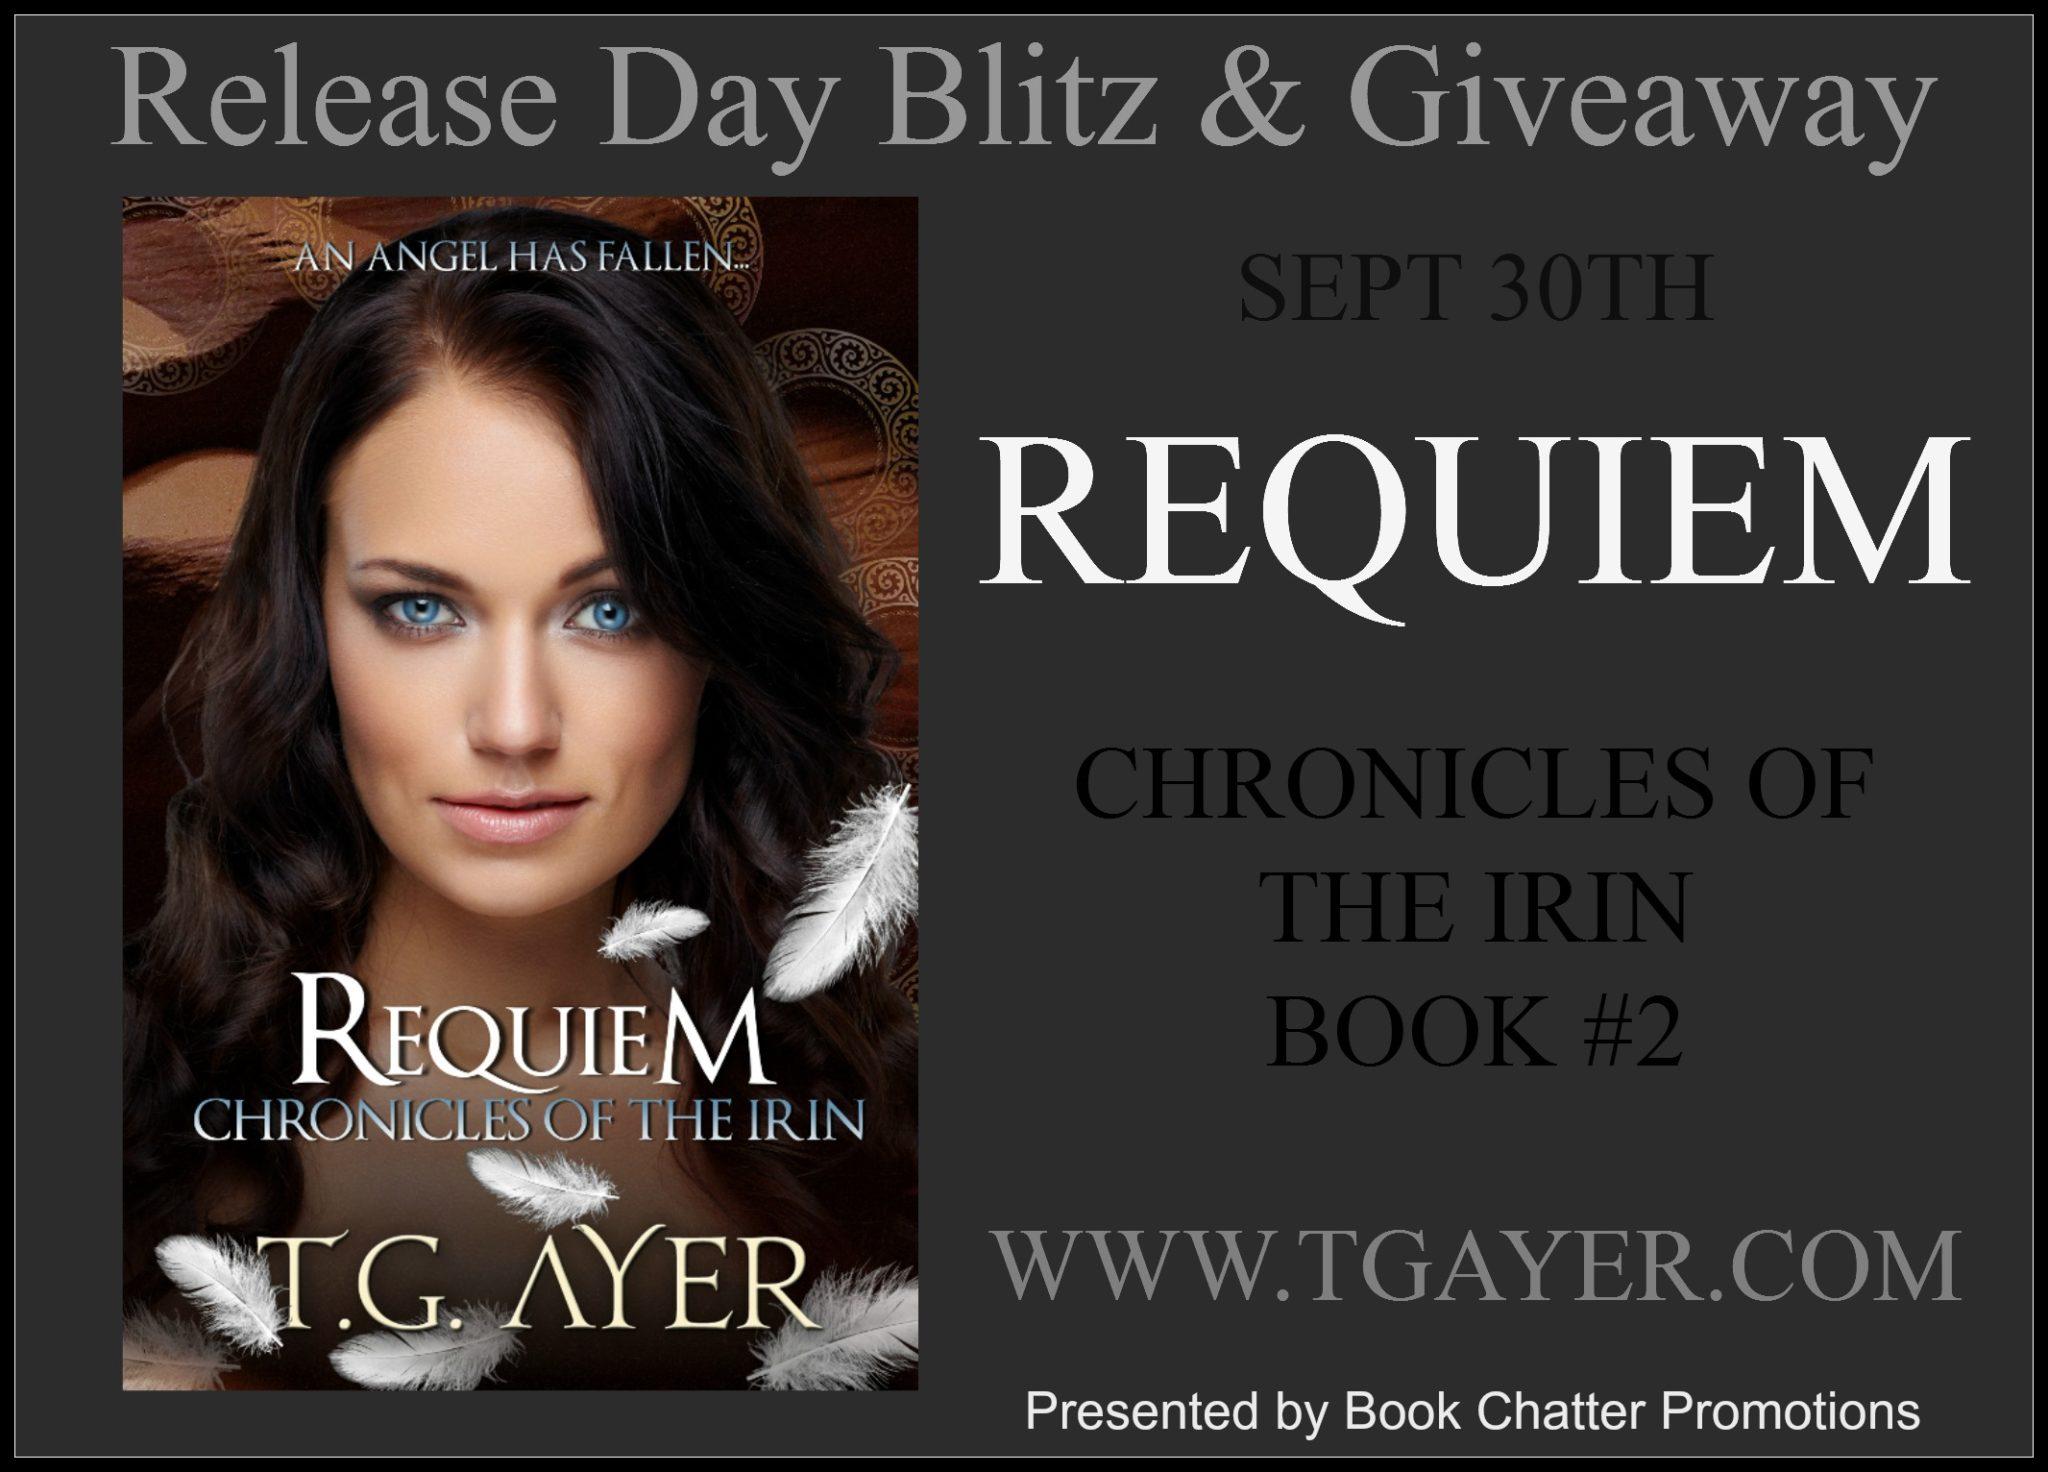 Book News: Reqiuem Release Day Blitz